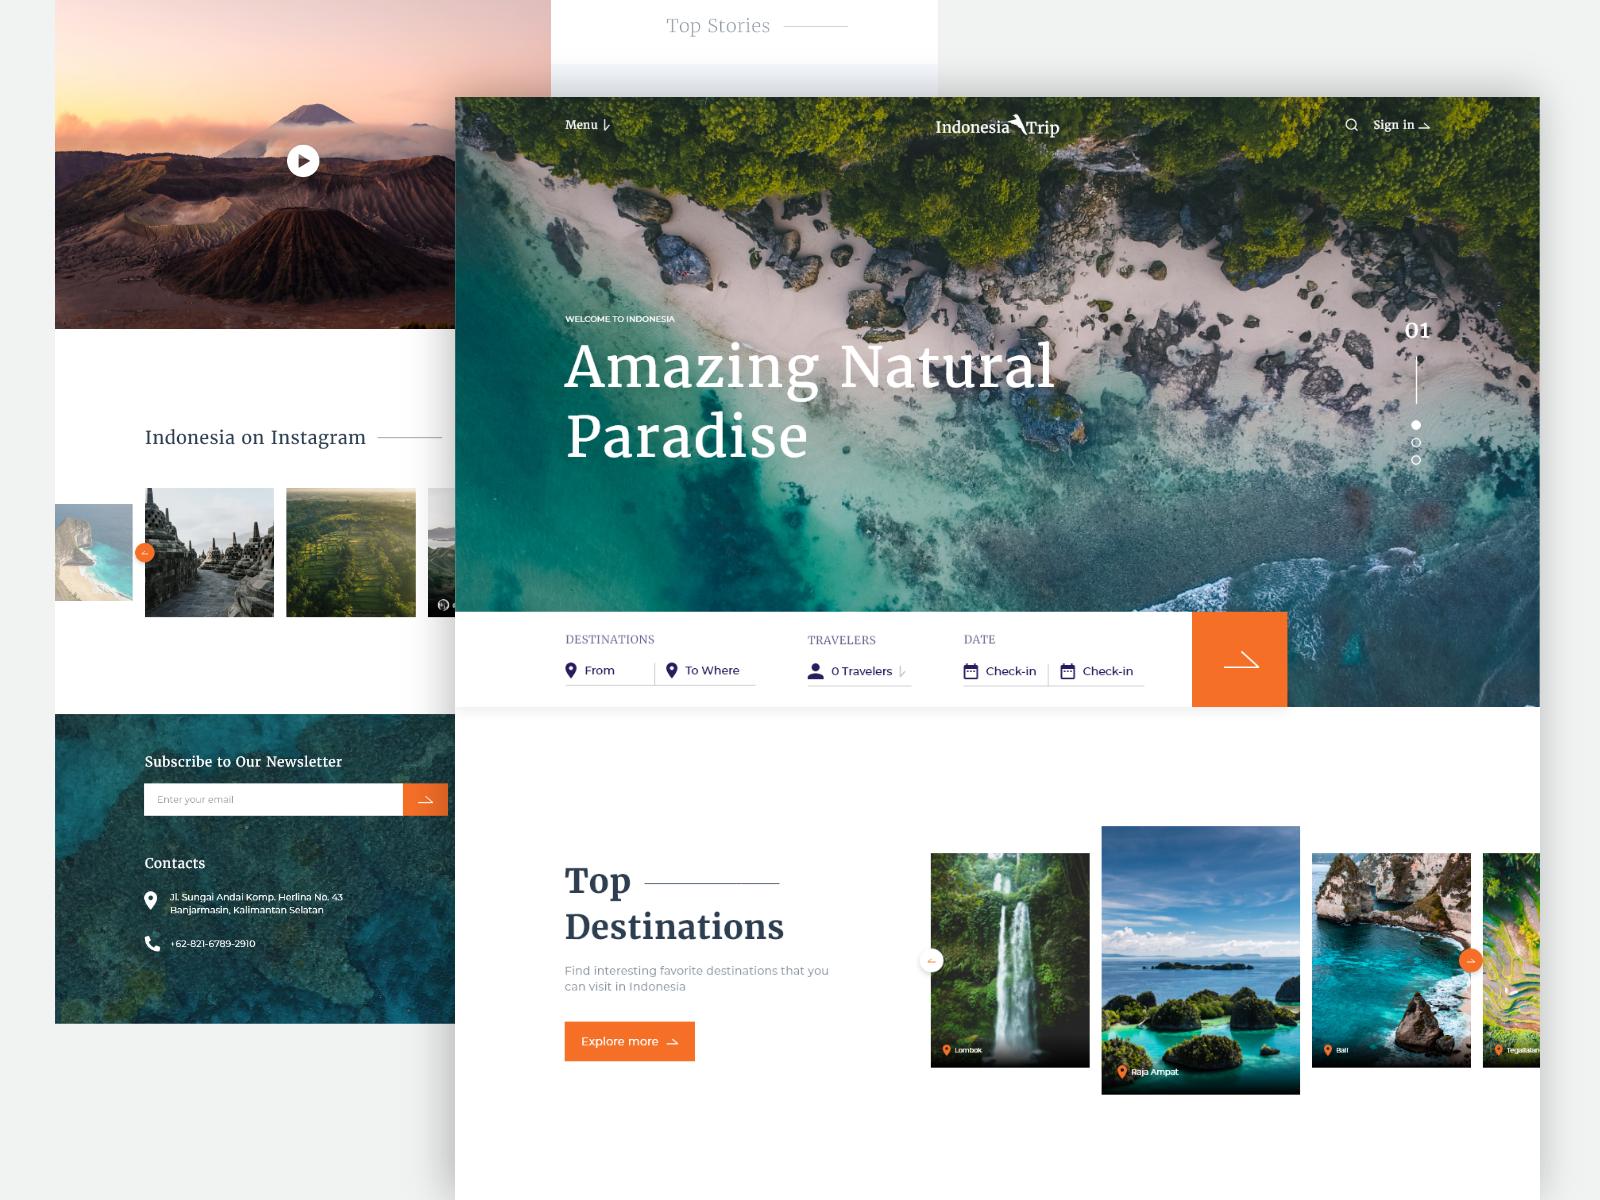 Indonesia Trip & Travel Website Design by Ardi Yodam on Dribbble